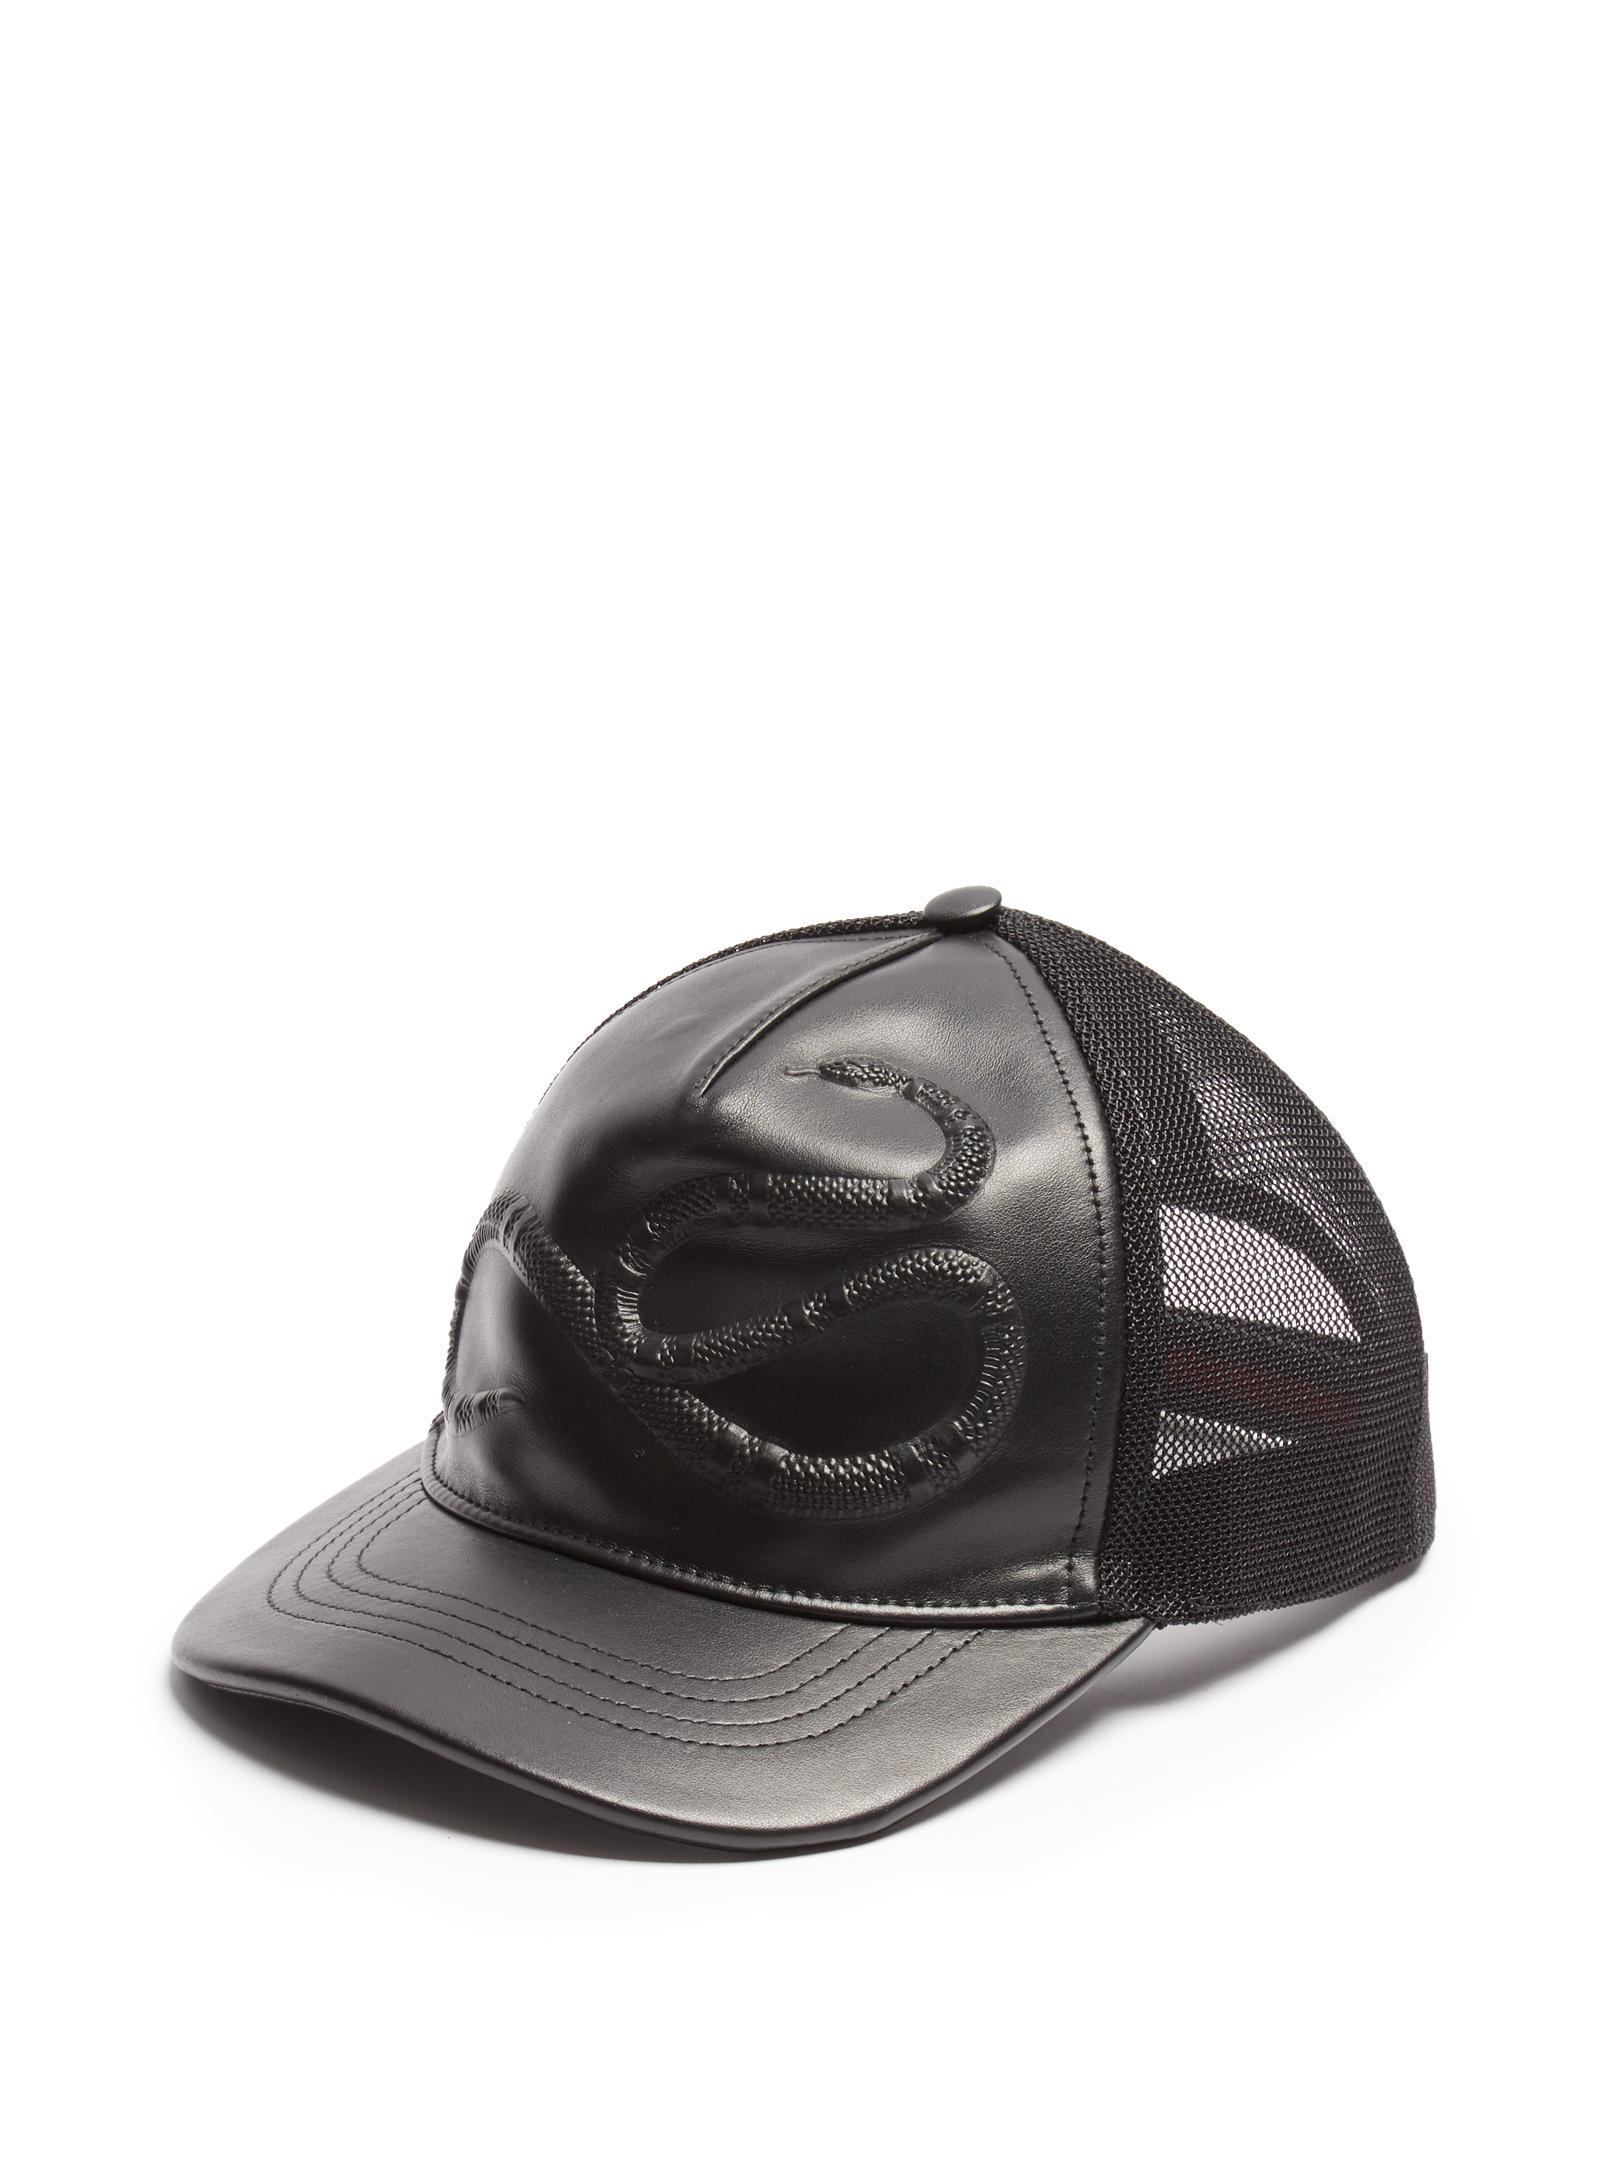 Lyst - Gucci Snake-embossed Leather Baseball Cap in Black for Men 52278707765